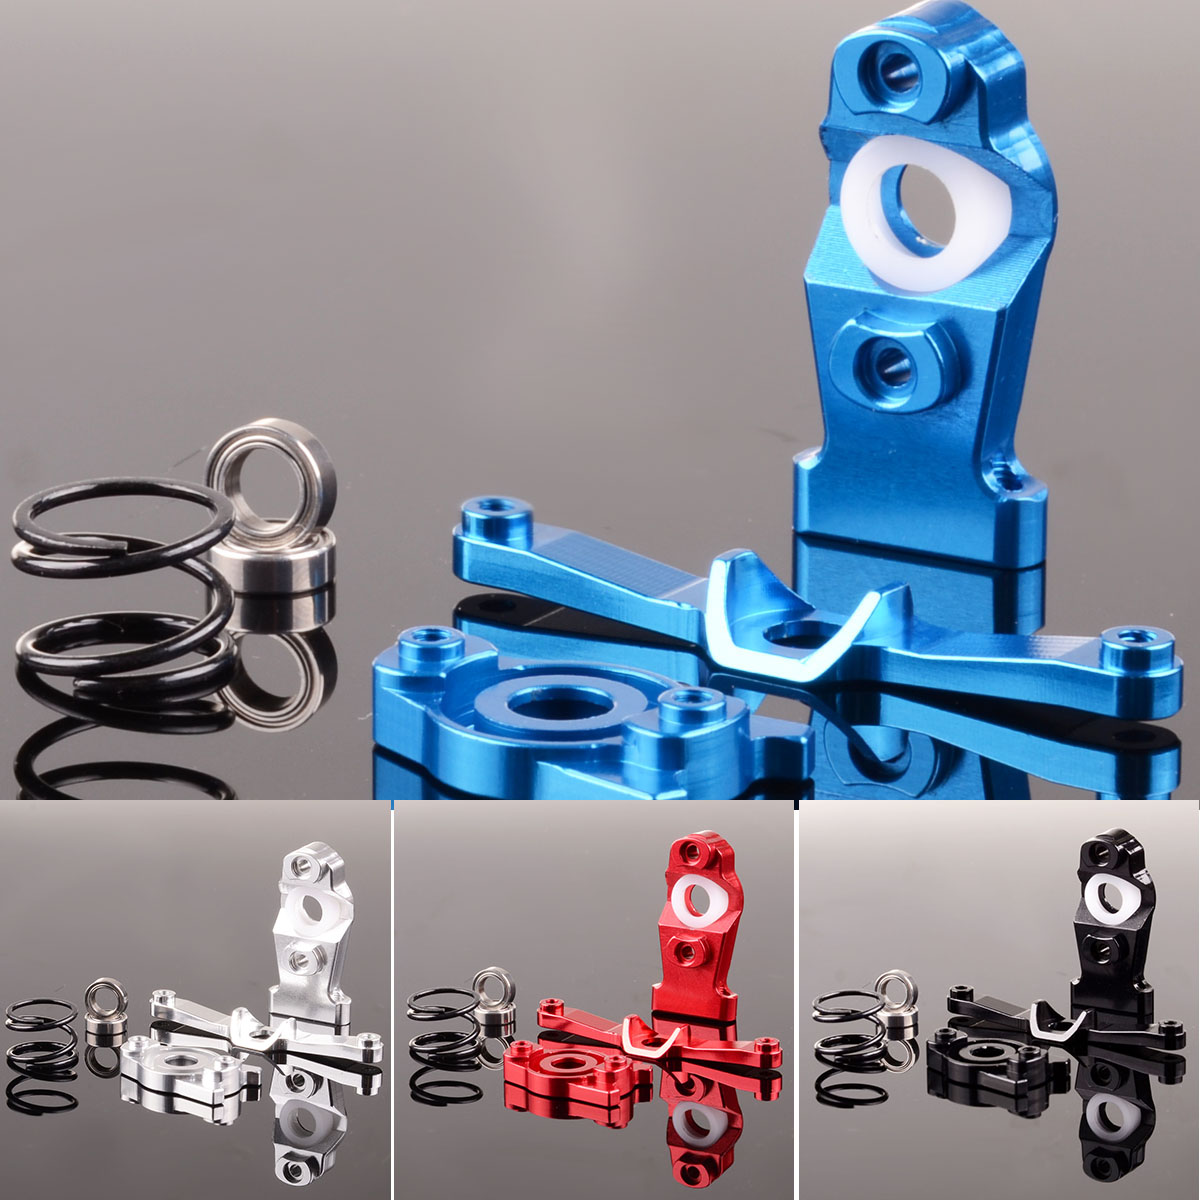 hight resolution of aluminum steering assembly erv048 for rc gpm traxxas 1 16 e revo slash summit 1 16